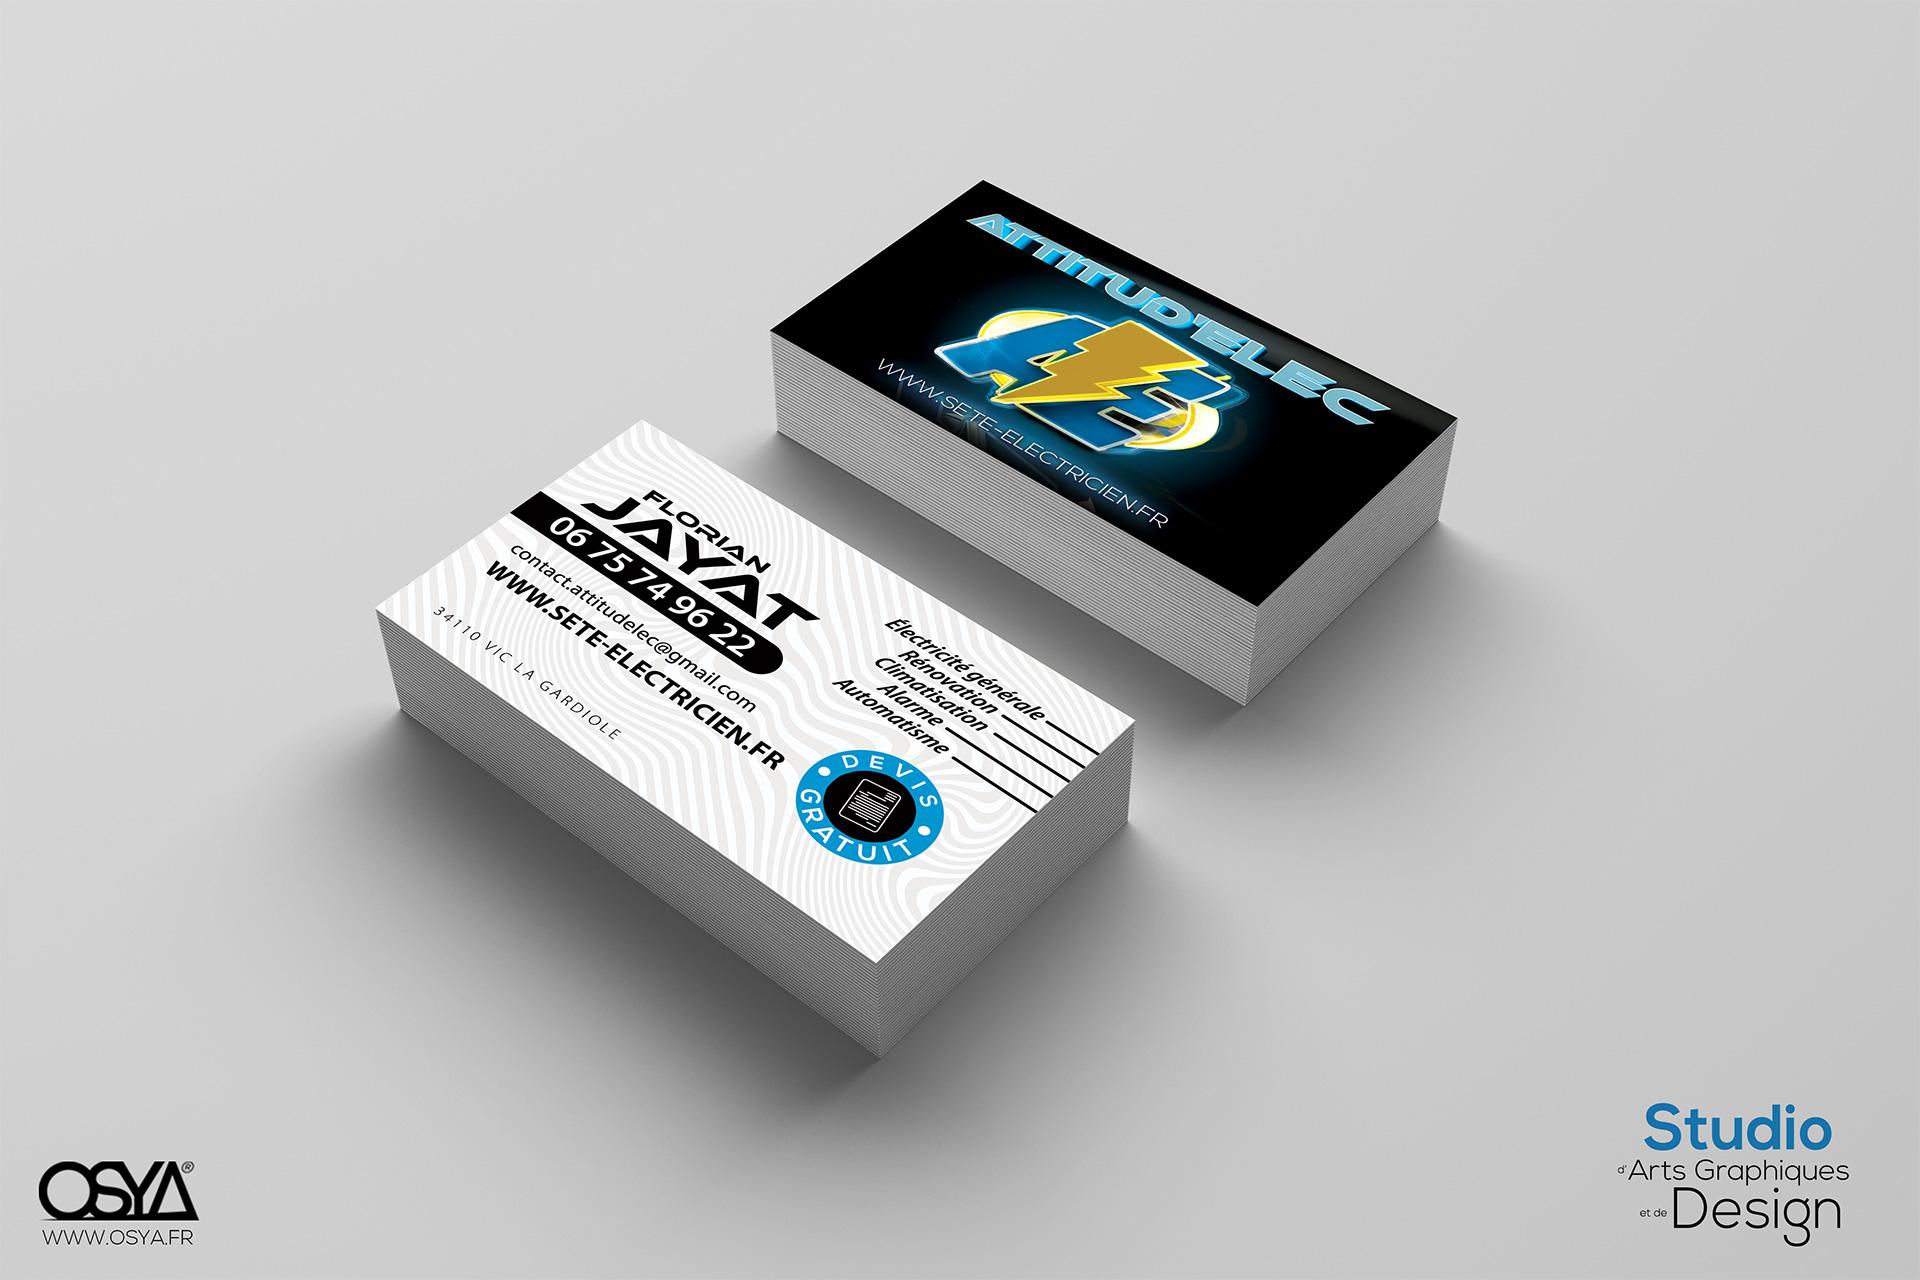 Attitudelec-carte-de-visite-02